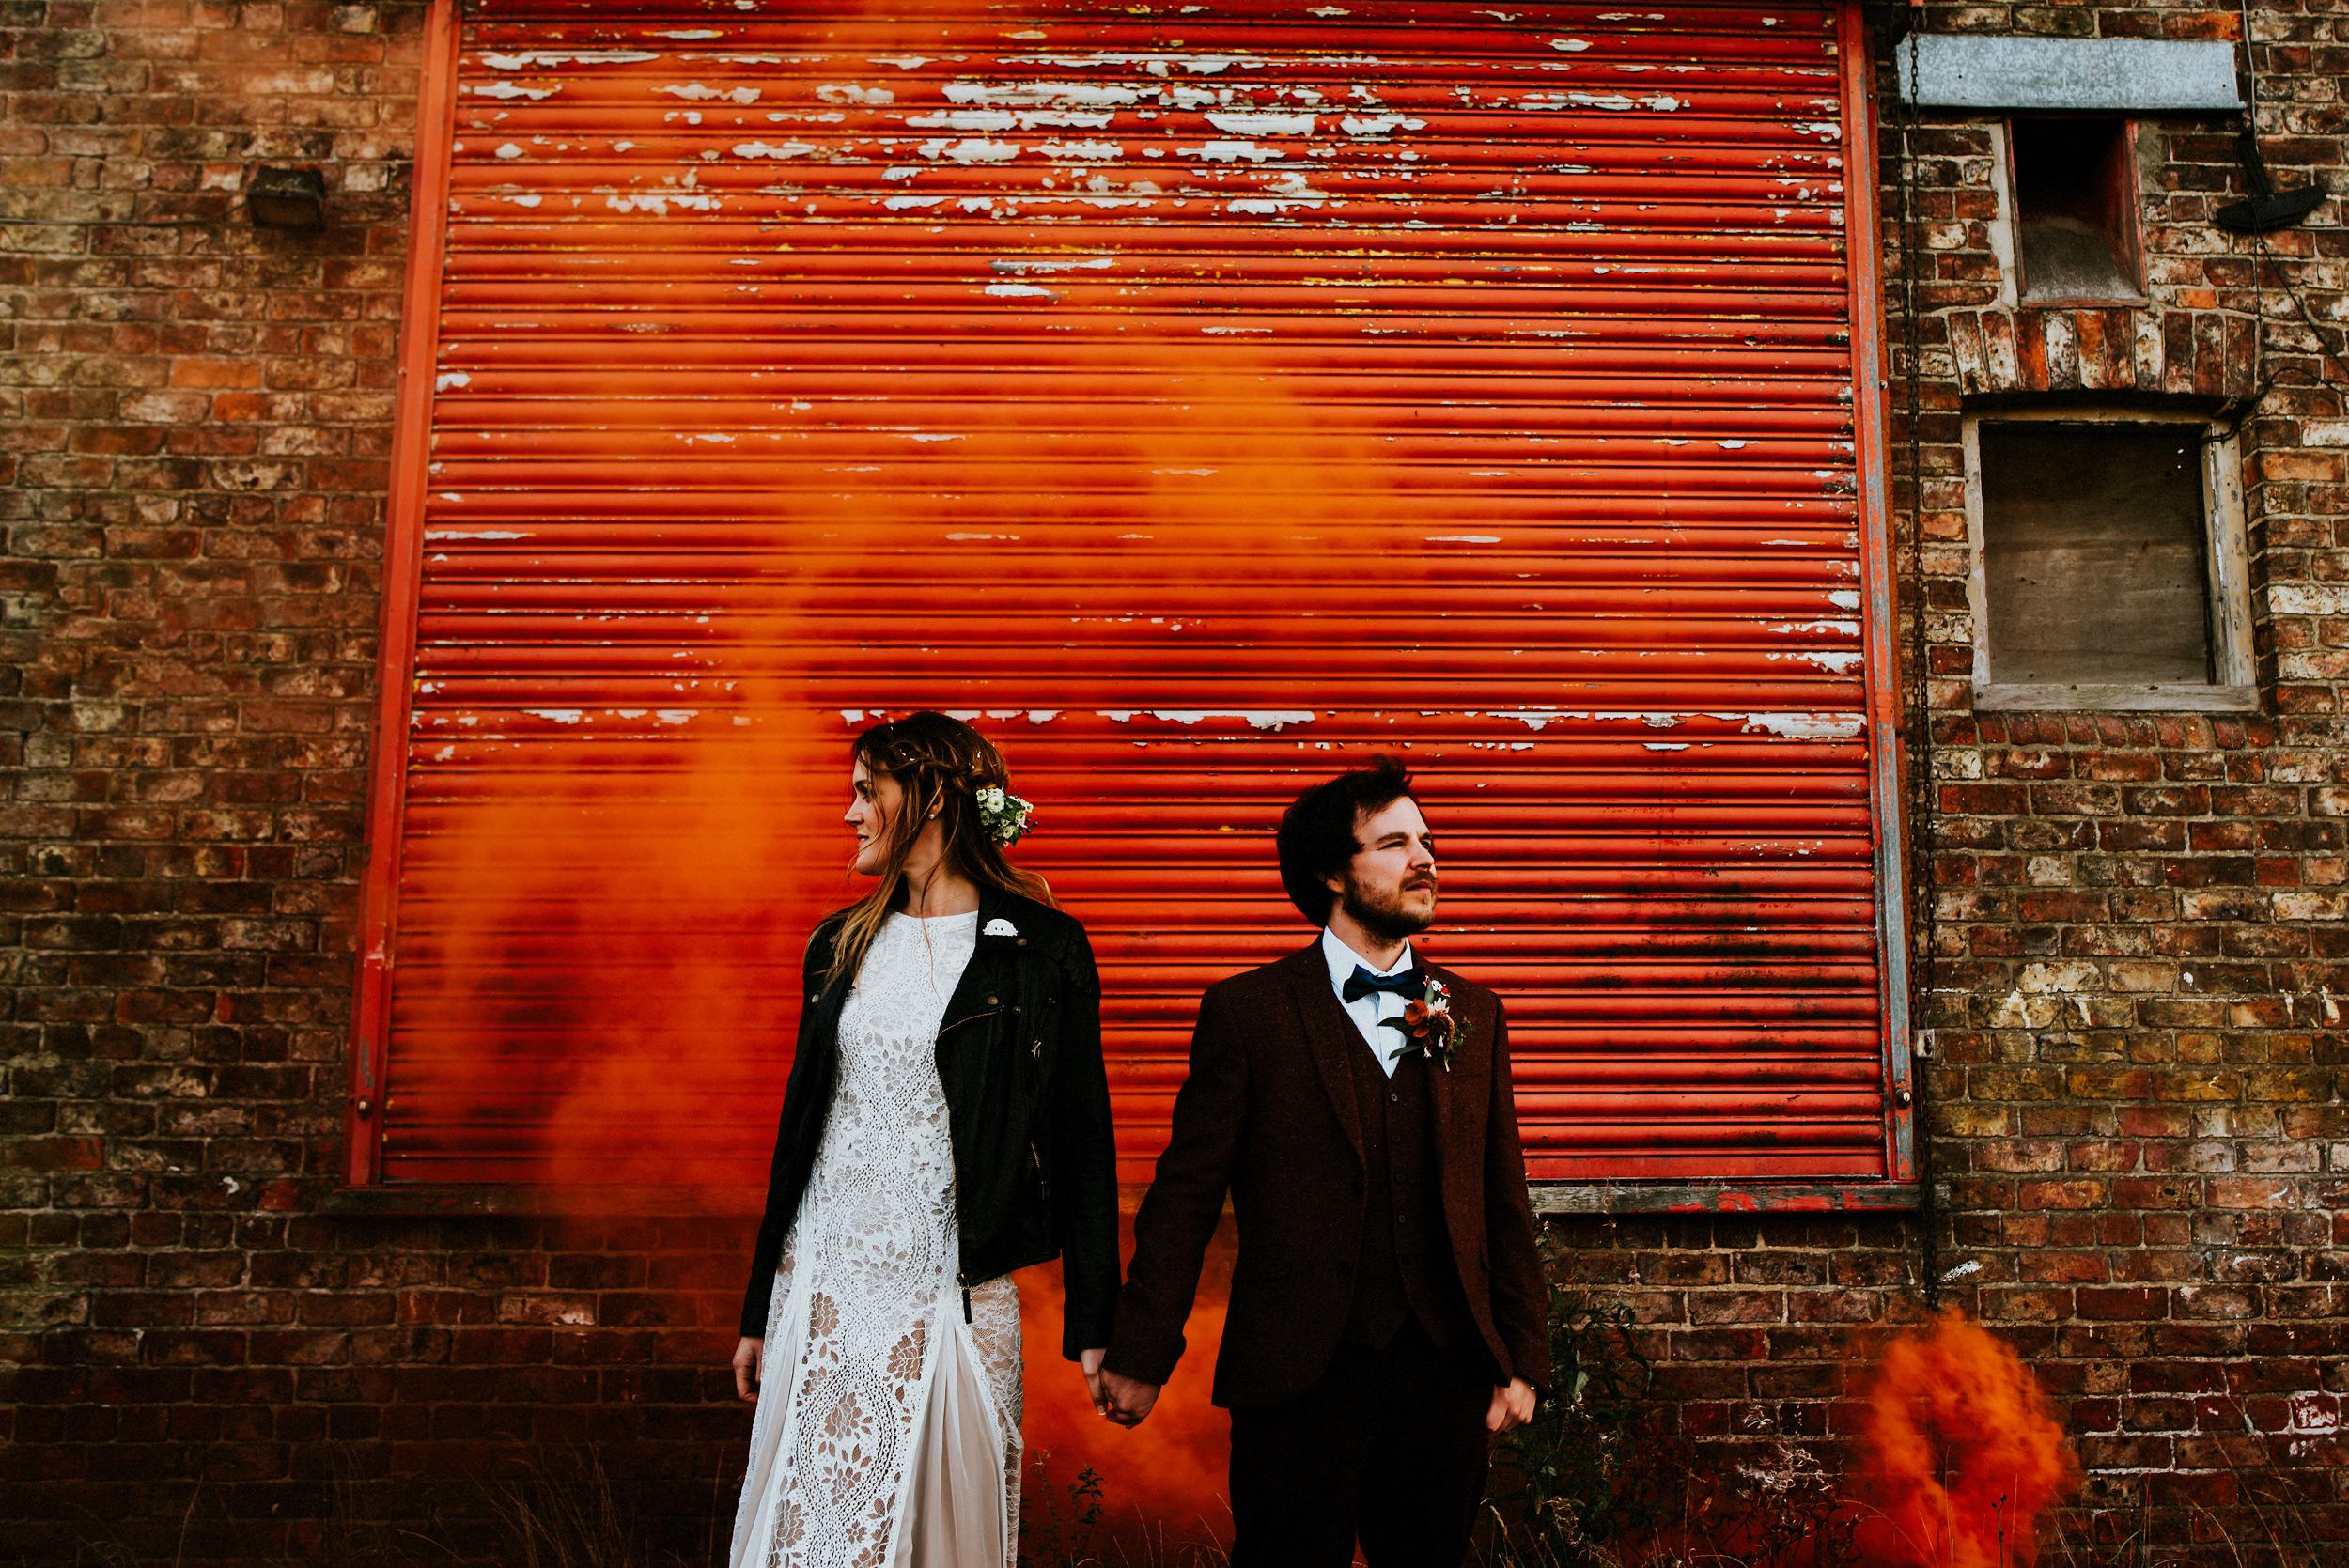 York0Wedding-Photographer-Spotted-Ox-Tockwith-Wedding-55.jpg